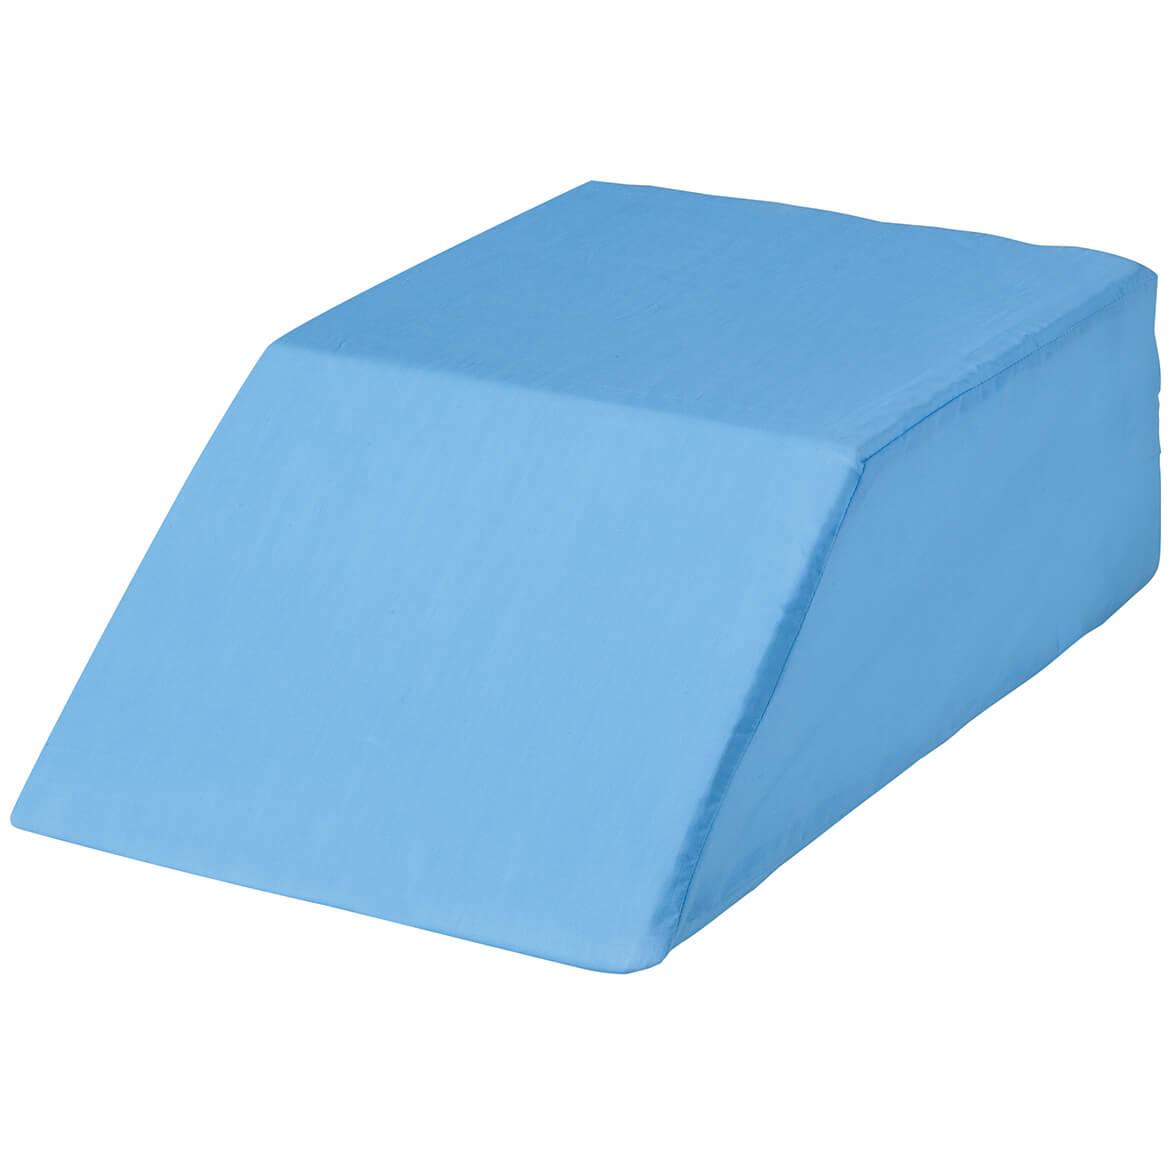 elevated leg lift pillow